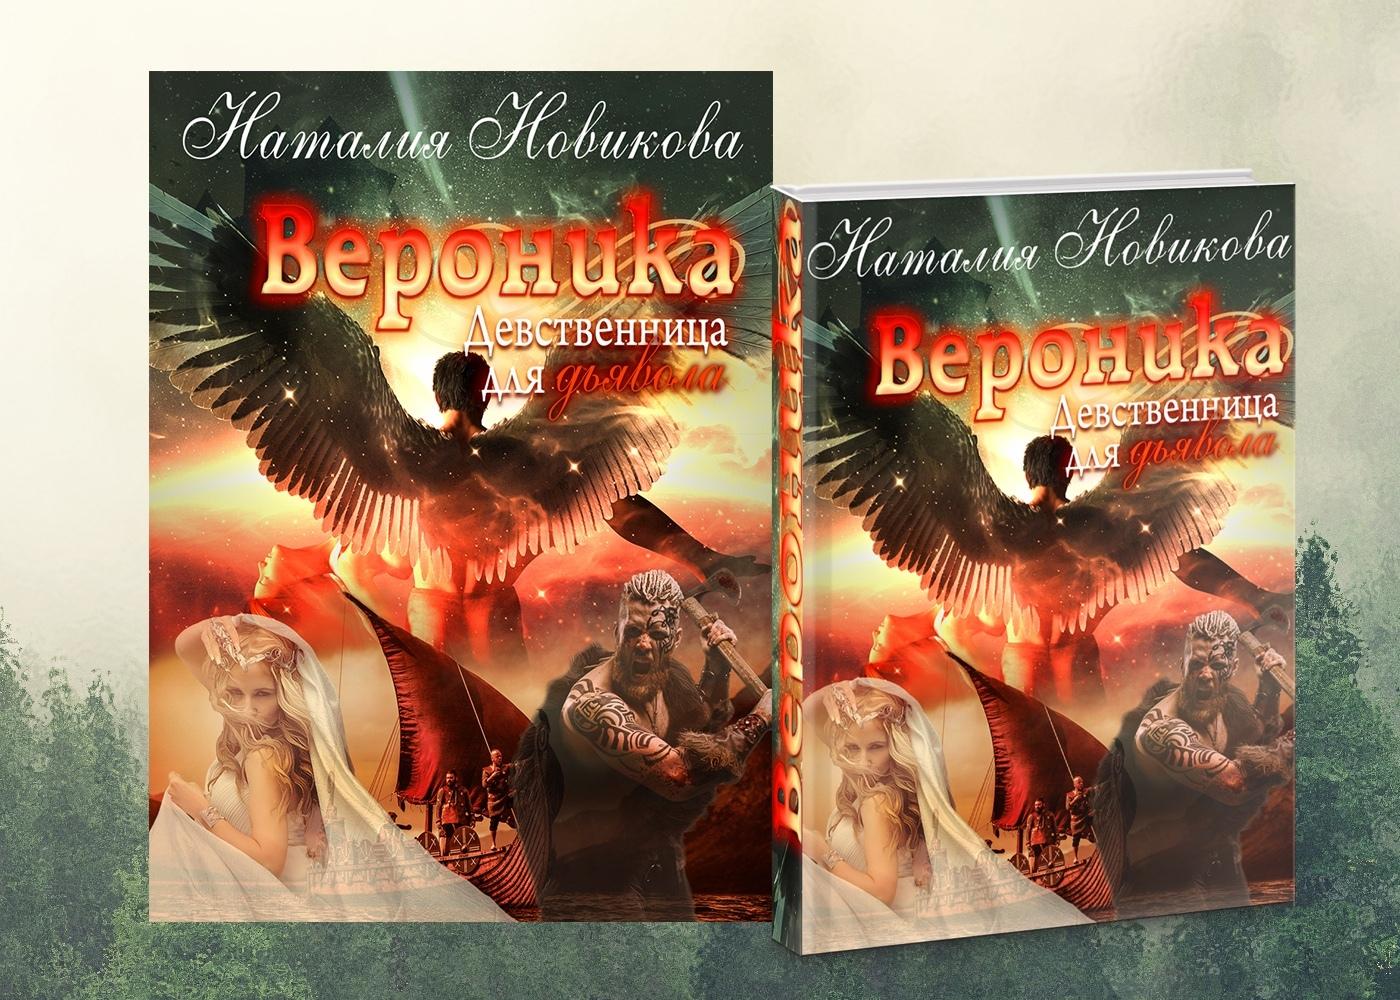 https://litnet.com/ru/book/veronika-devstvennica-dlya-dyavola-b212998